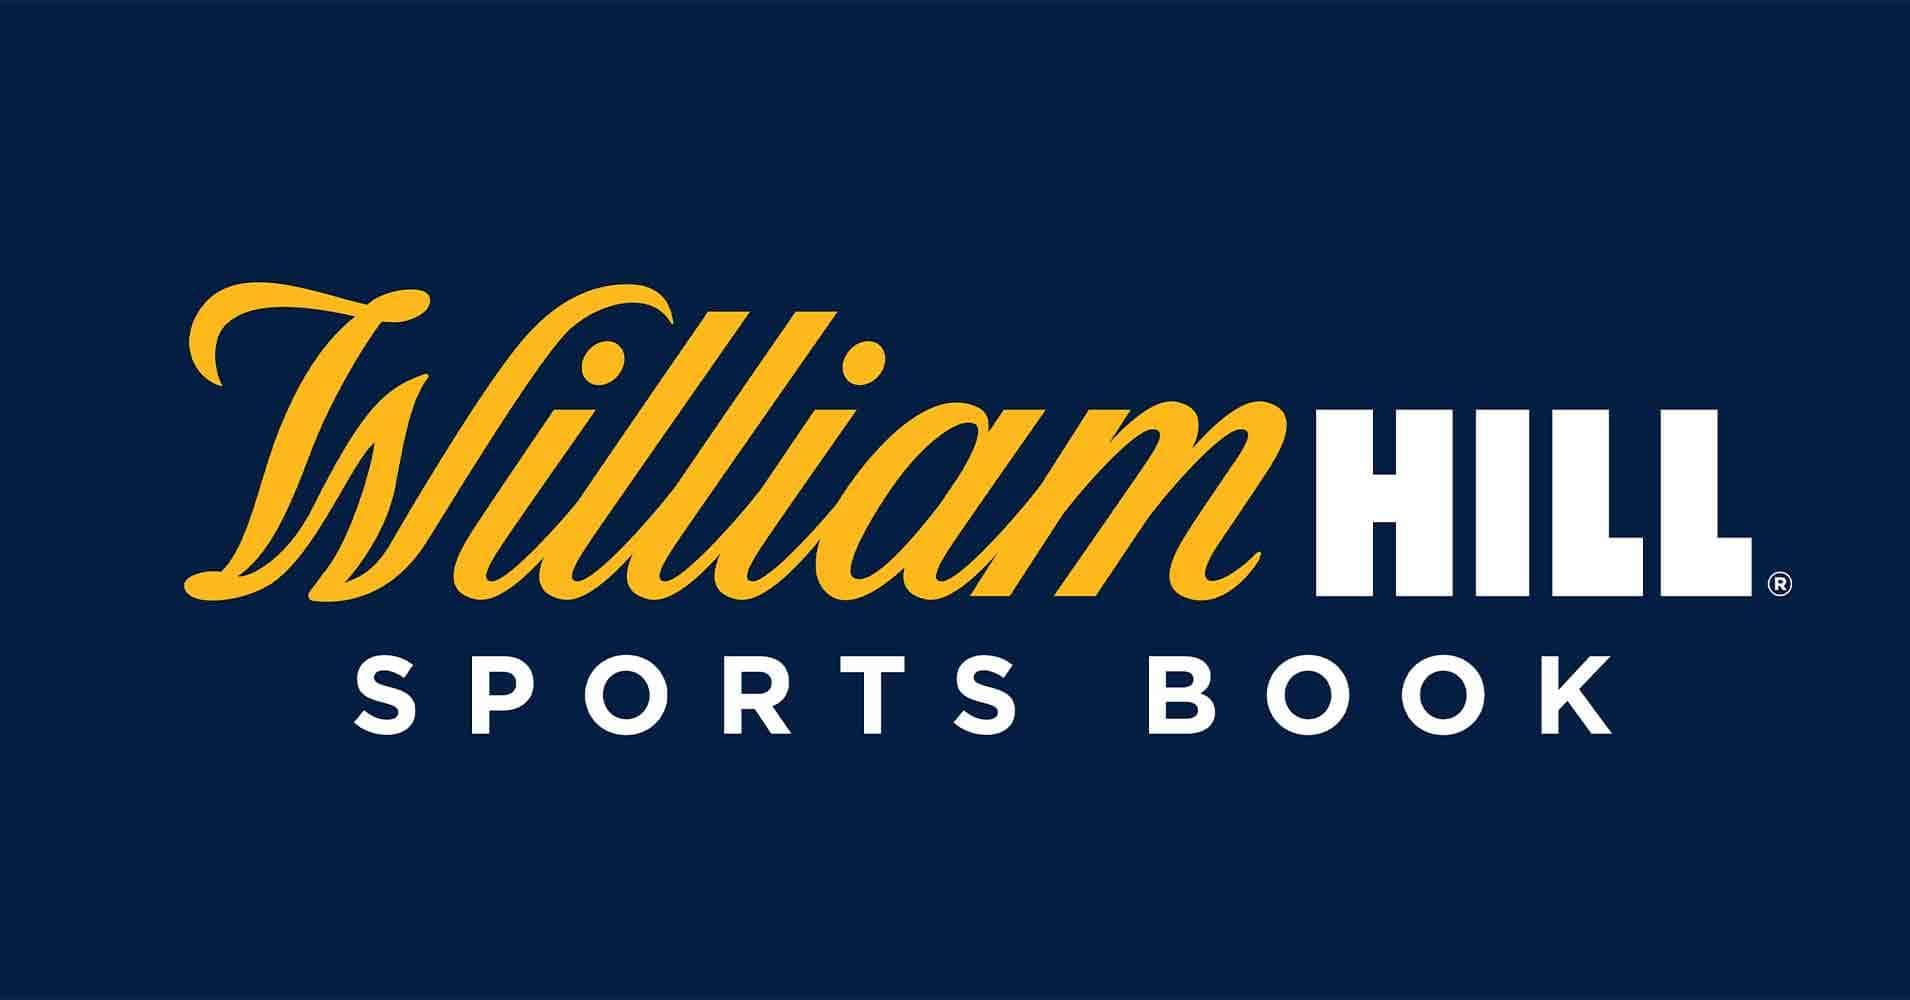 William Hill Sportsbook